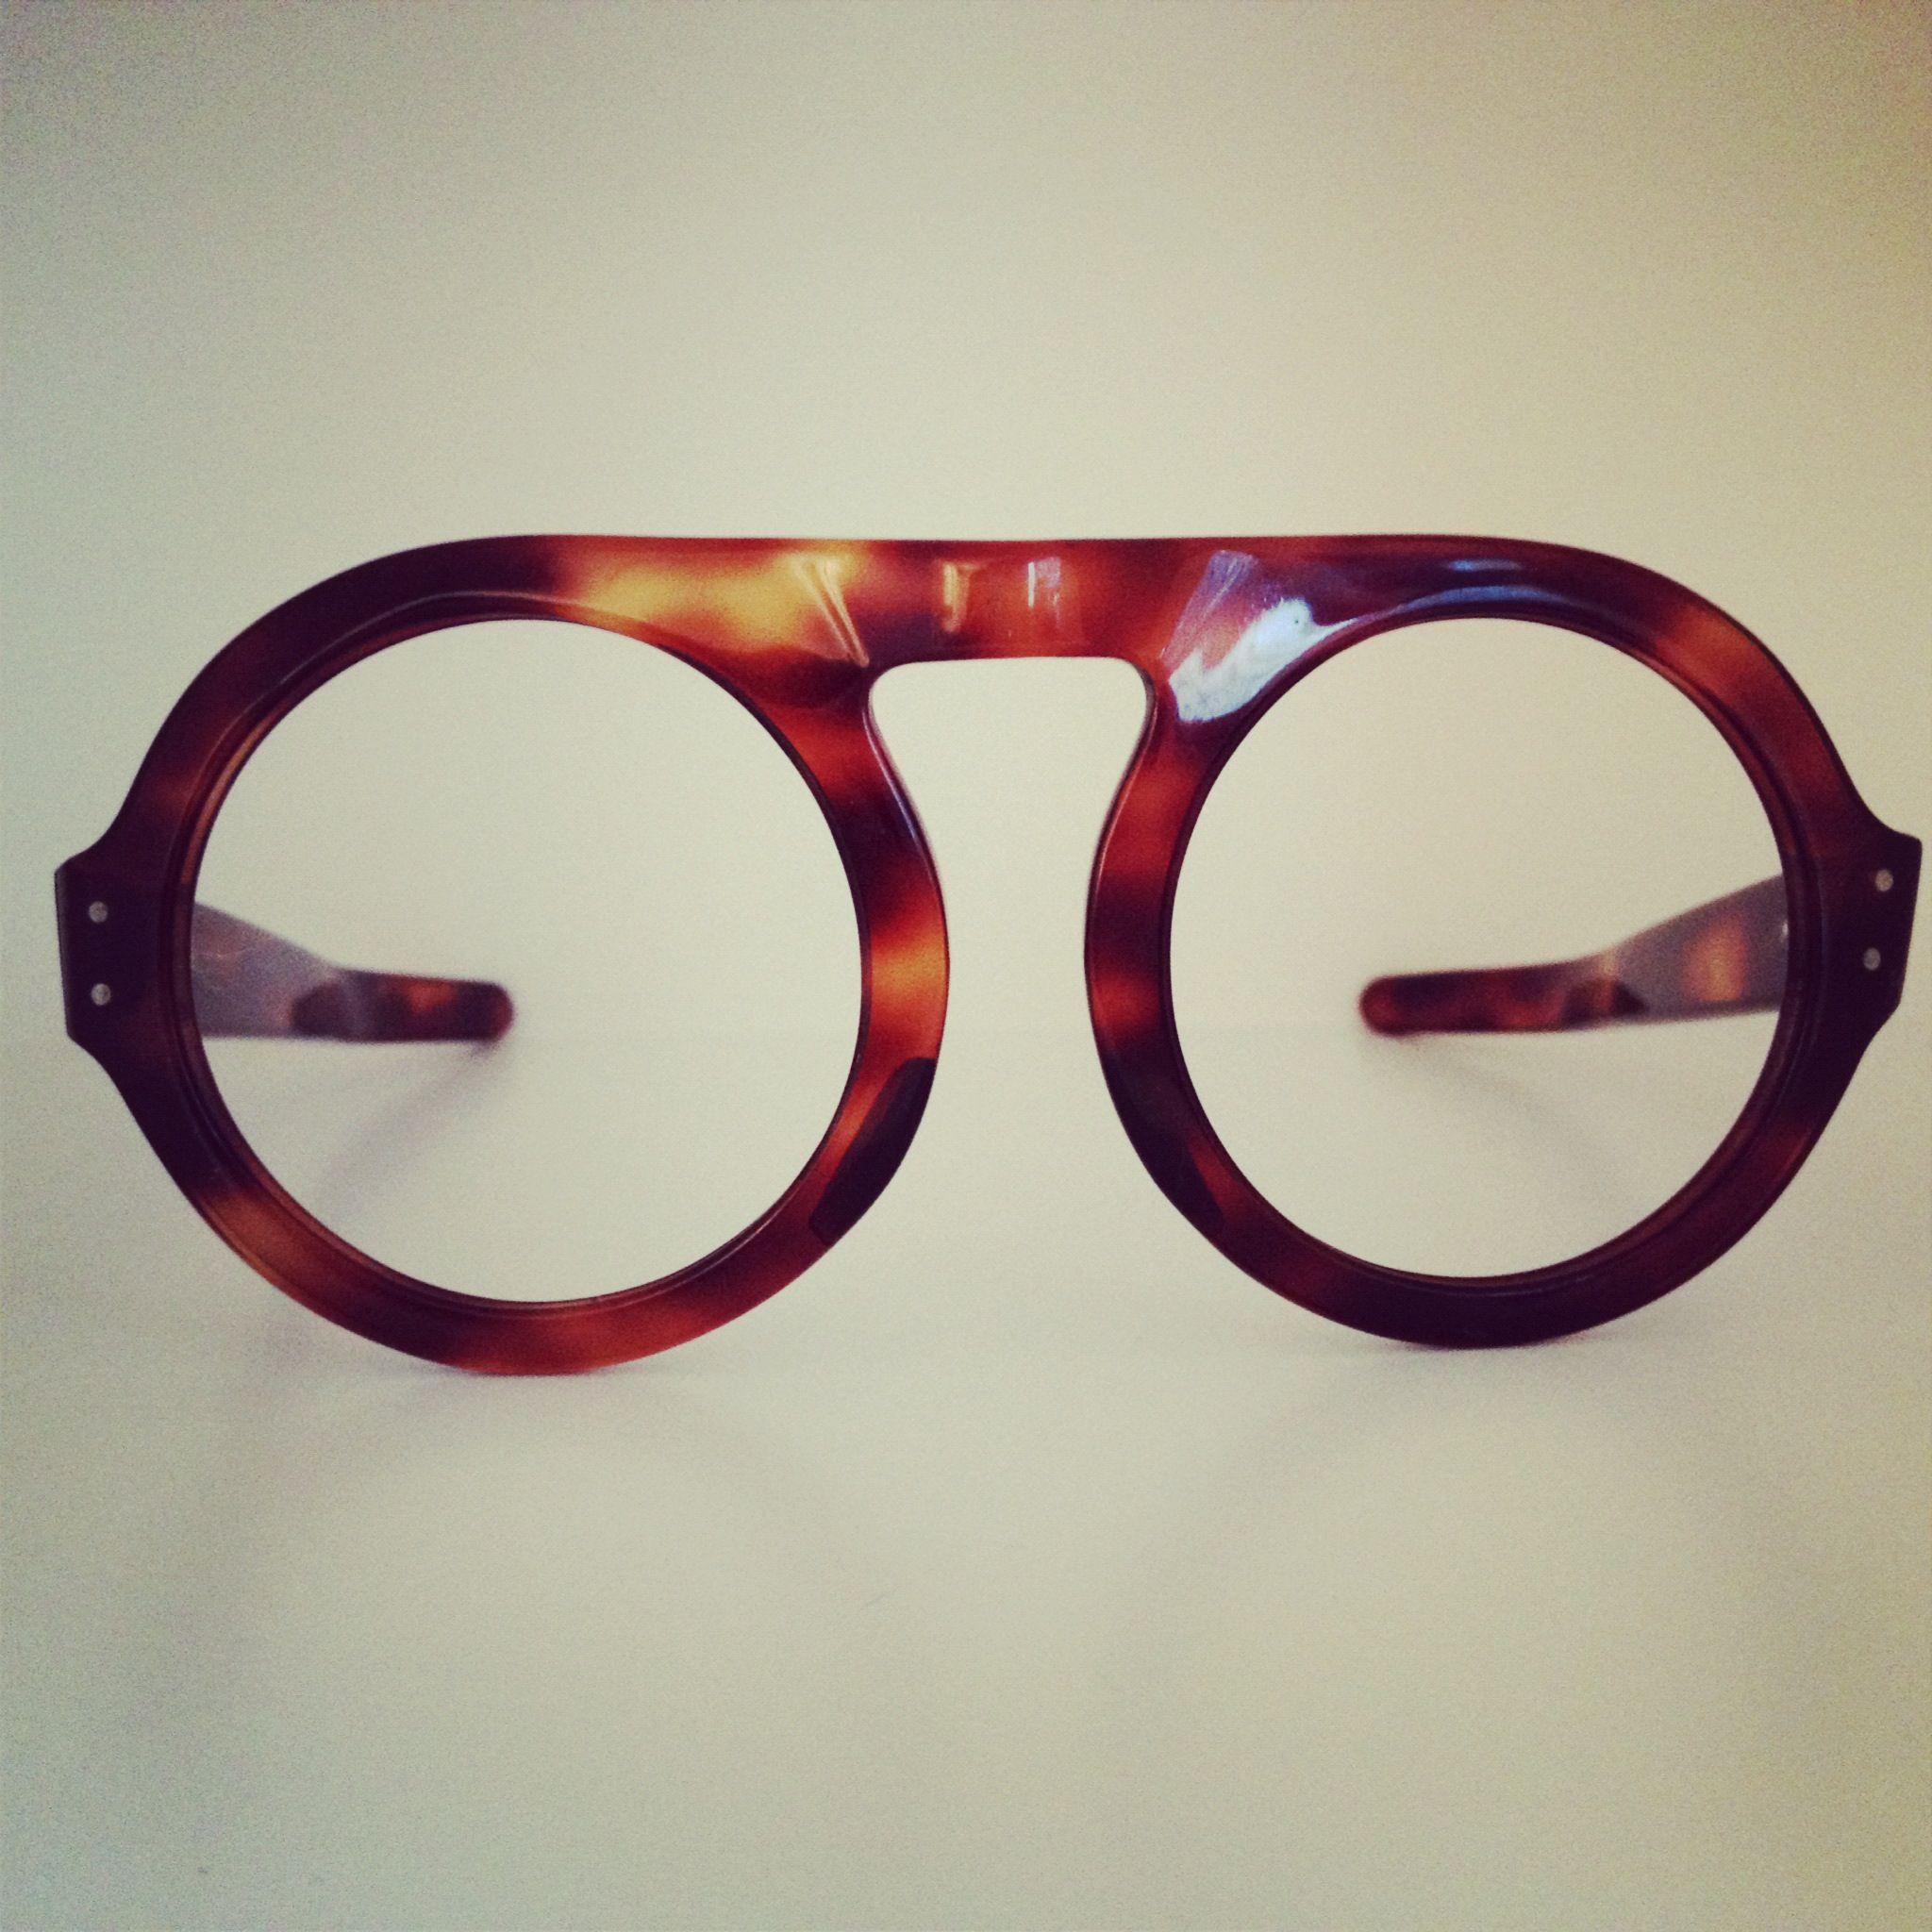 08dbbdefd Pierre Cardin | Eyewear | Pinterest | Óculos e Relógios